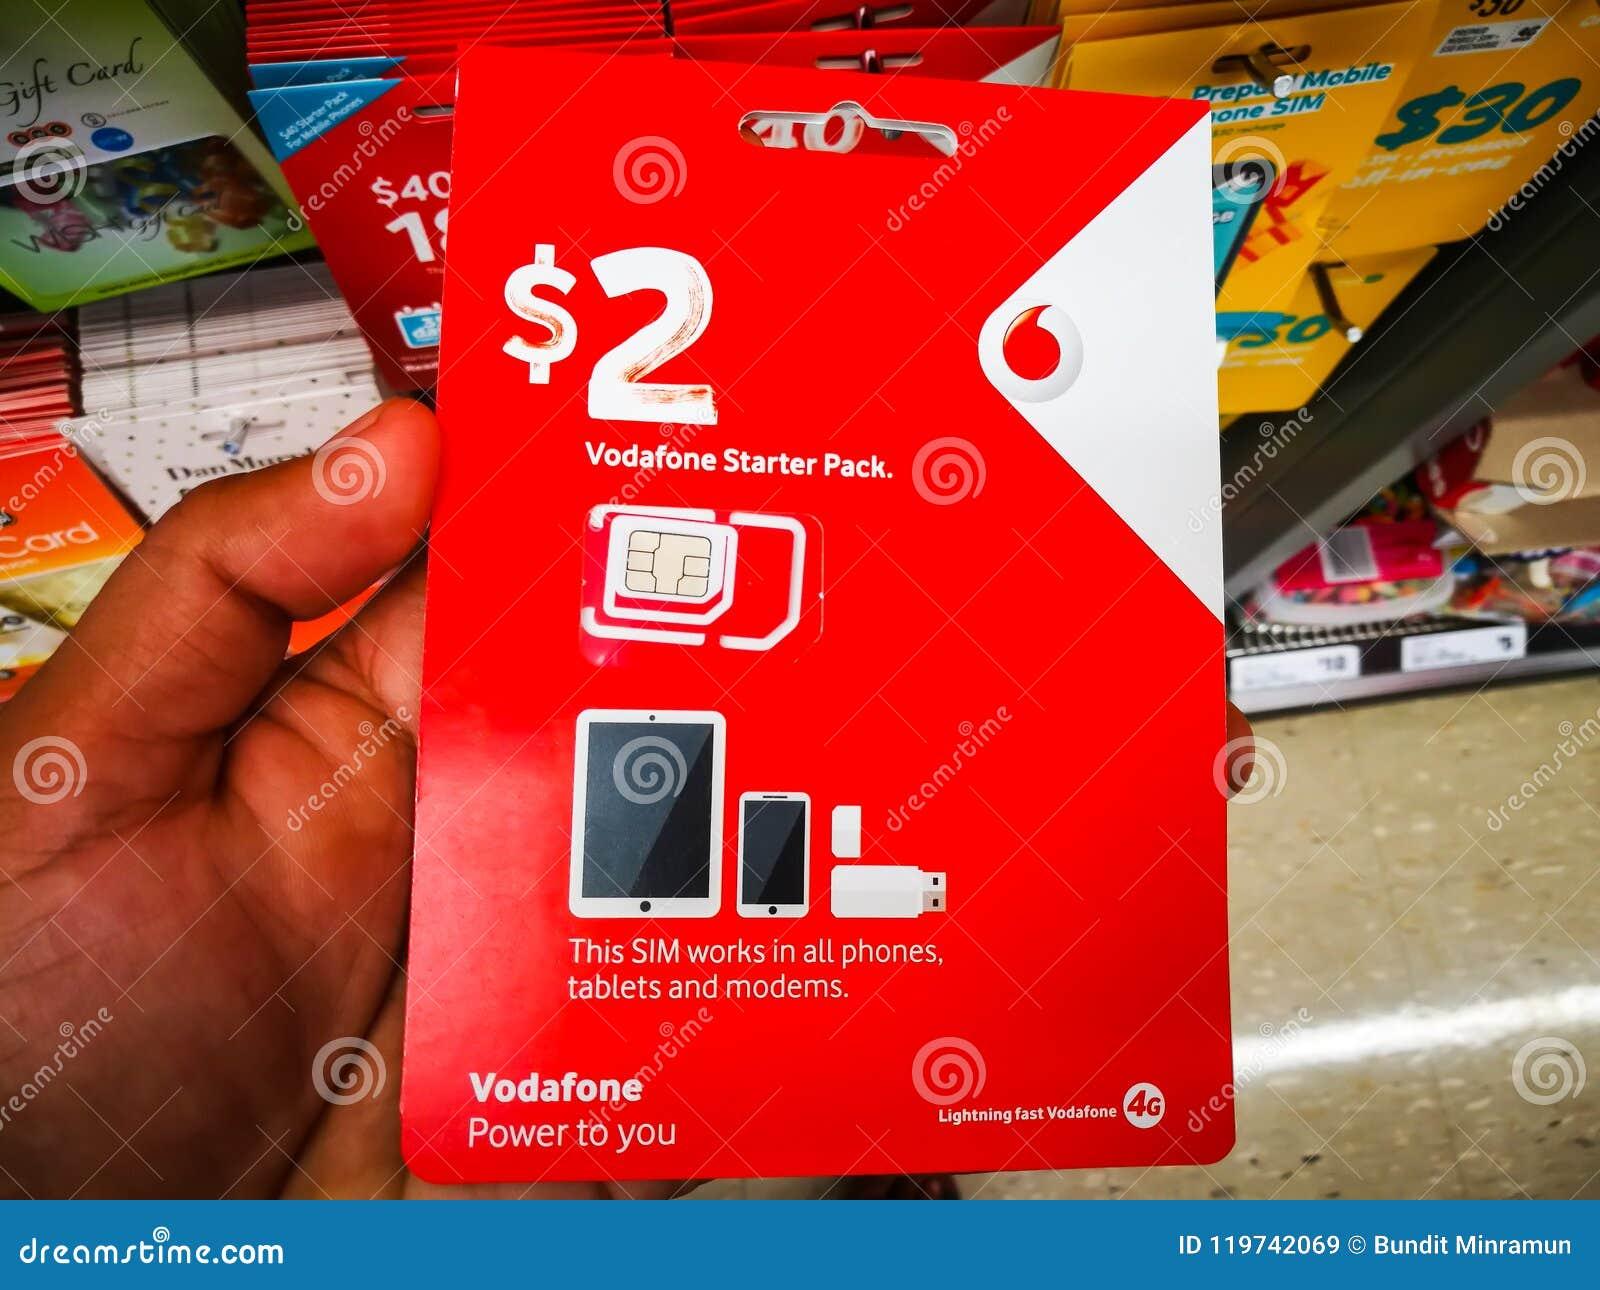 Vodafone Sim Karta 2 Dolara Prepaid Starter Dzwoni Pastylki I